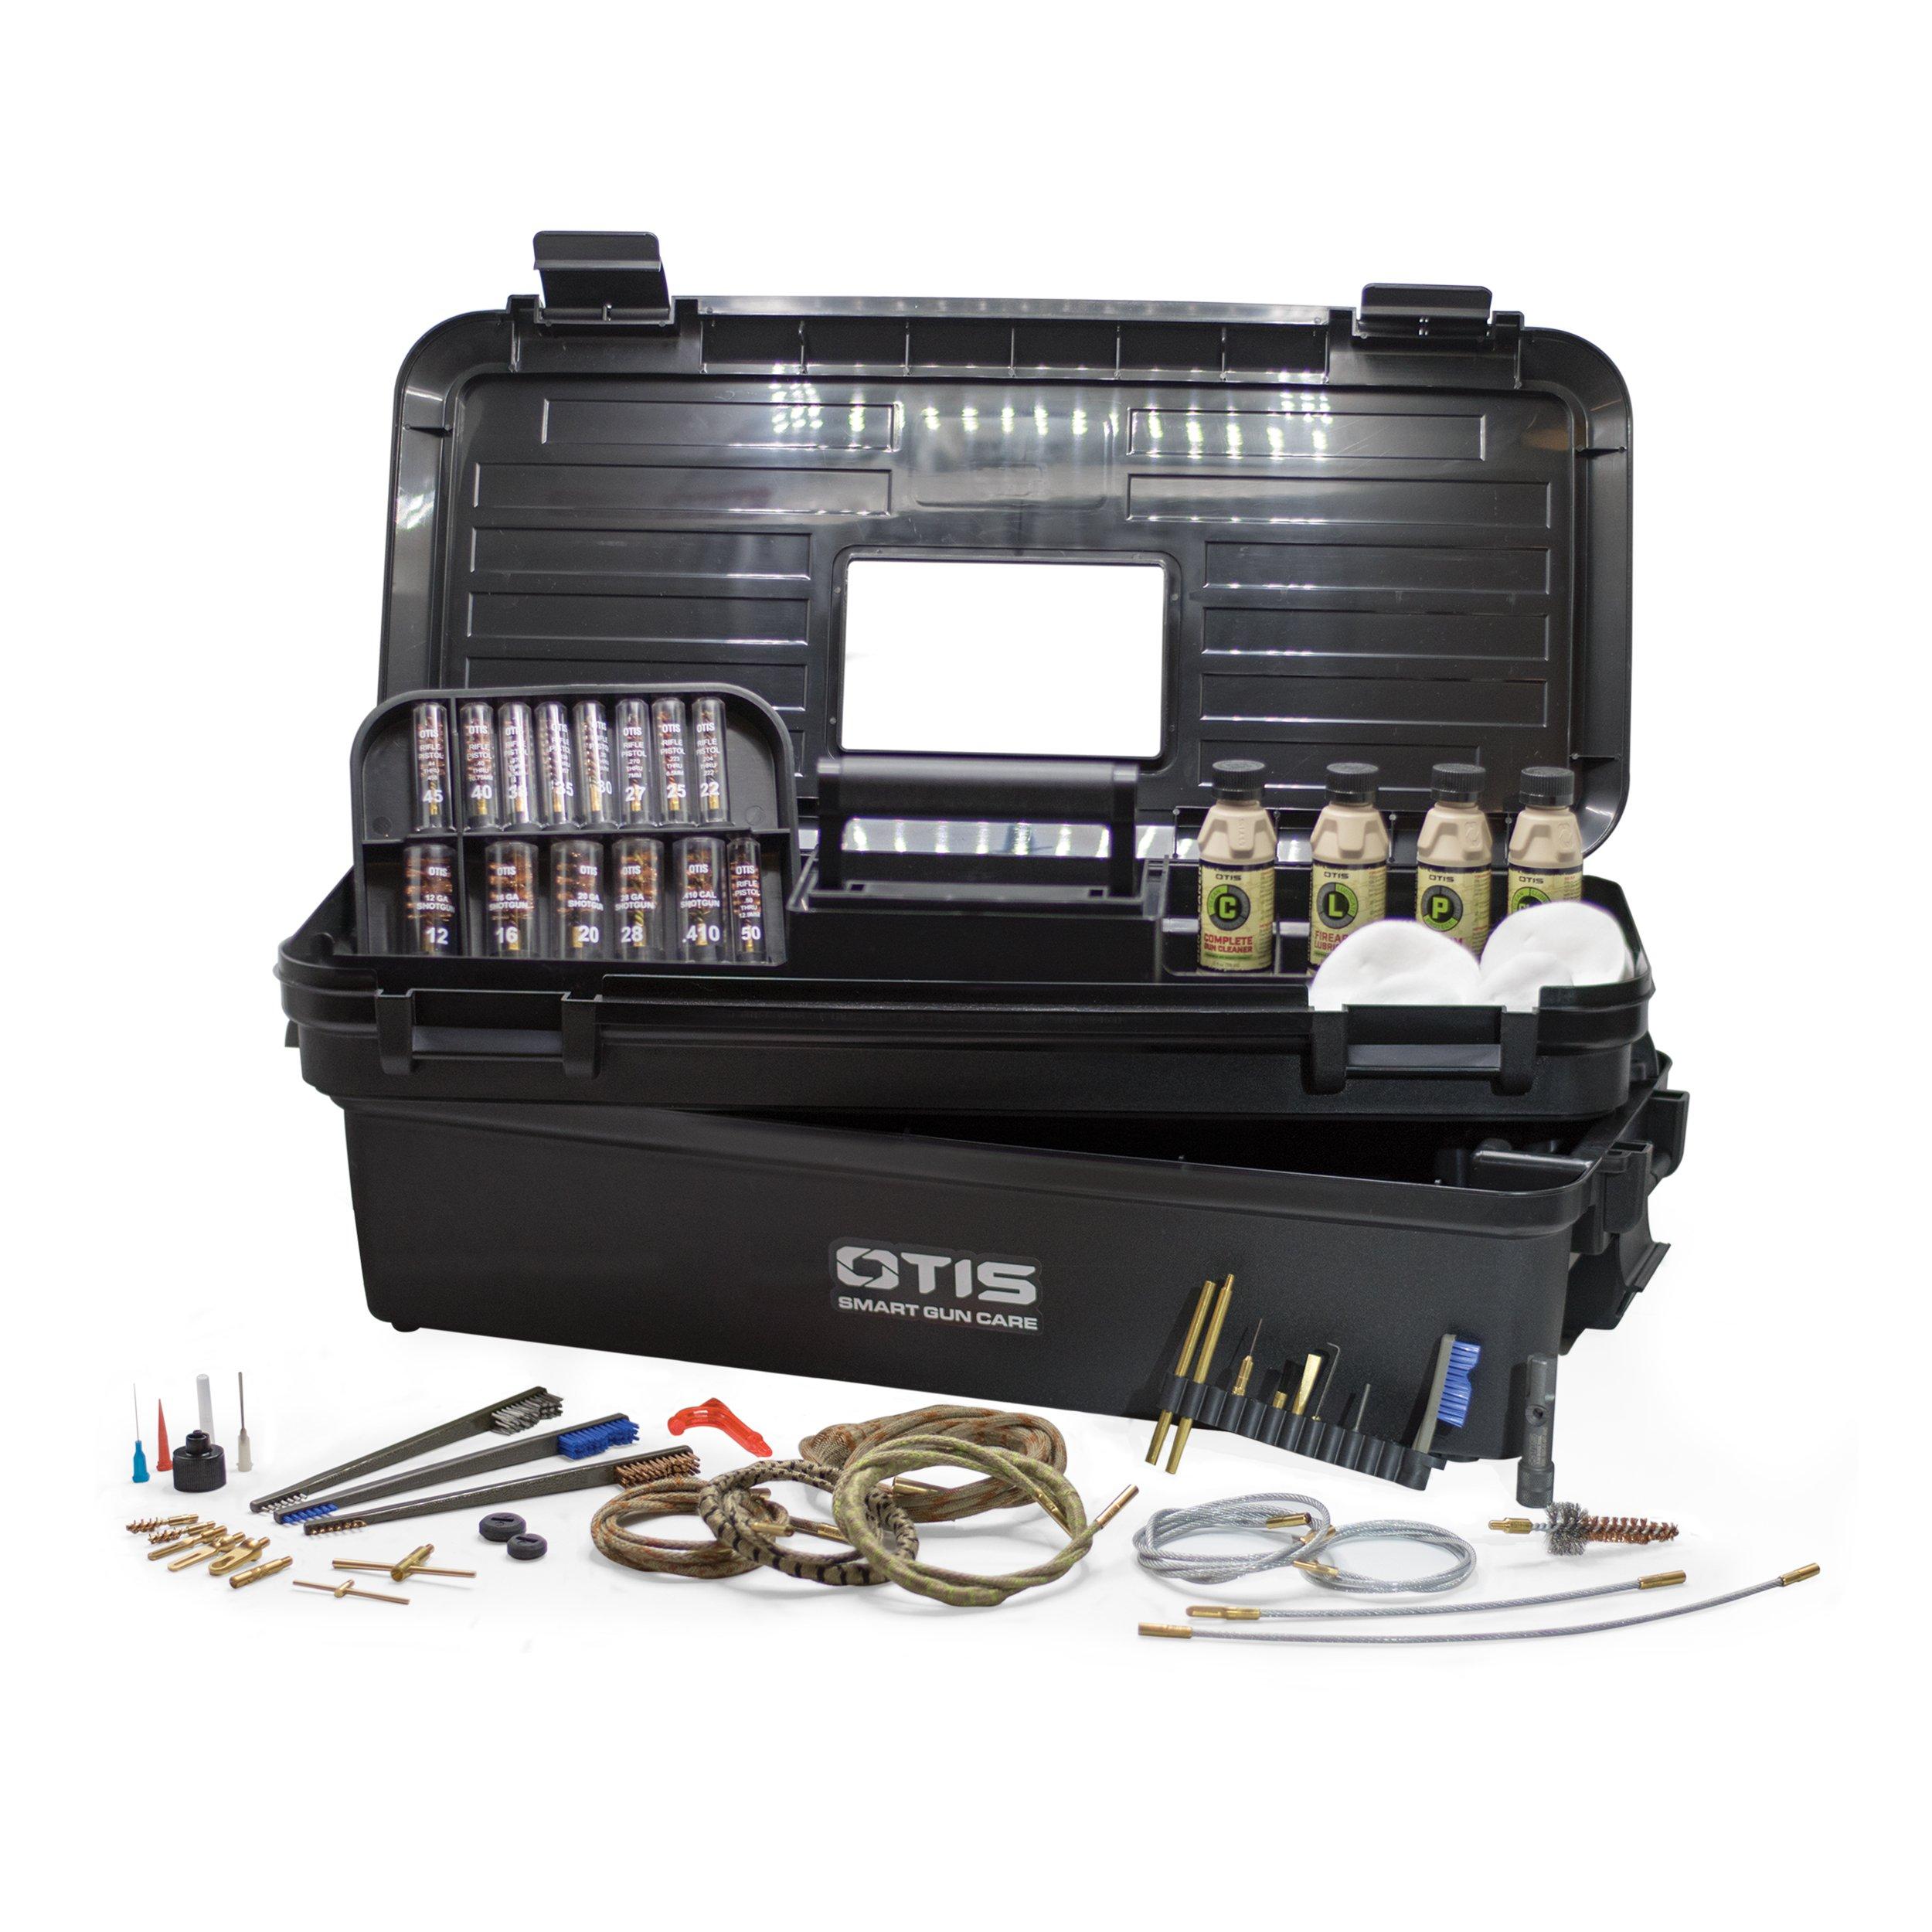 Otis All Caliber Elite Range Box with Universal Gun Cleaning Gear by Otis Technology